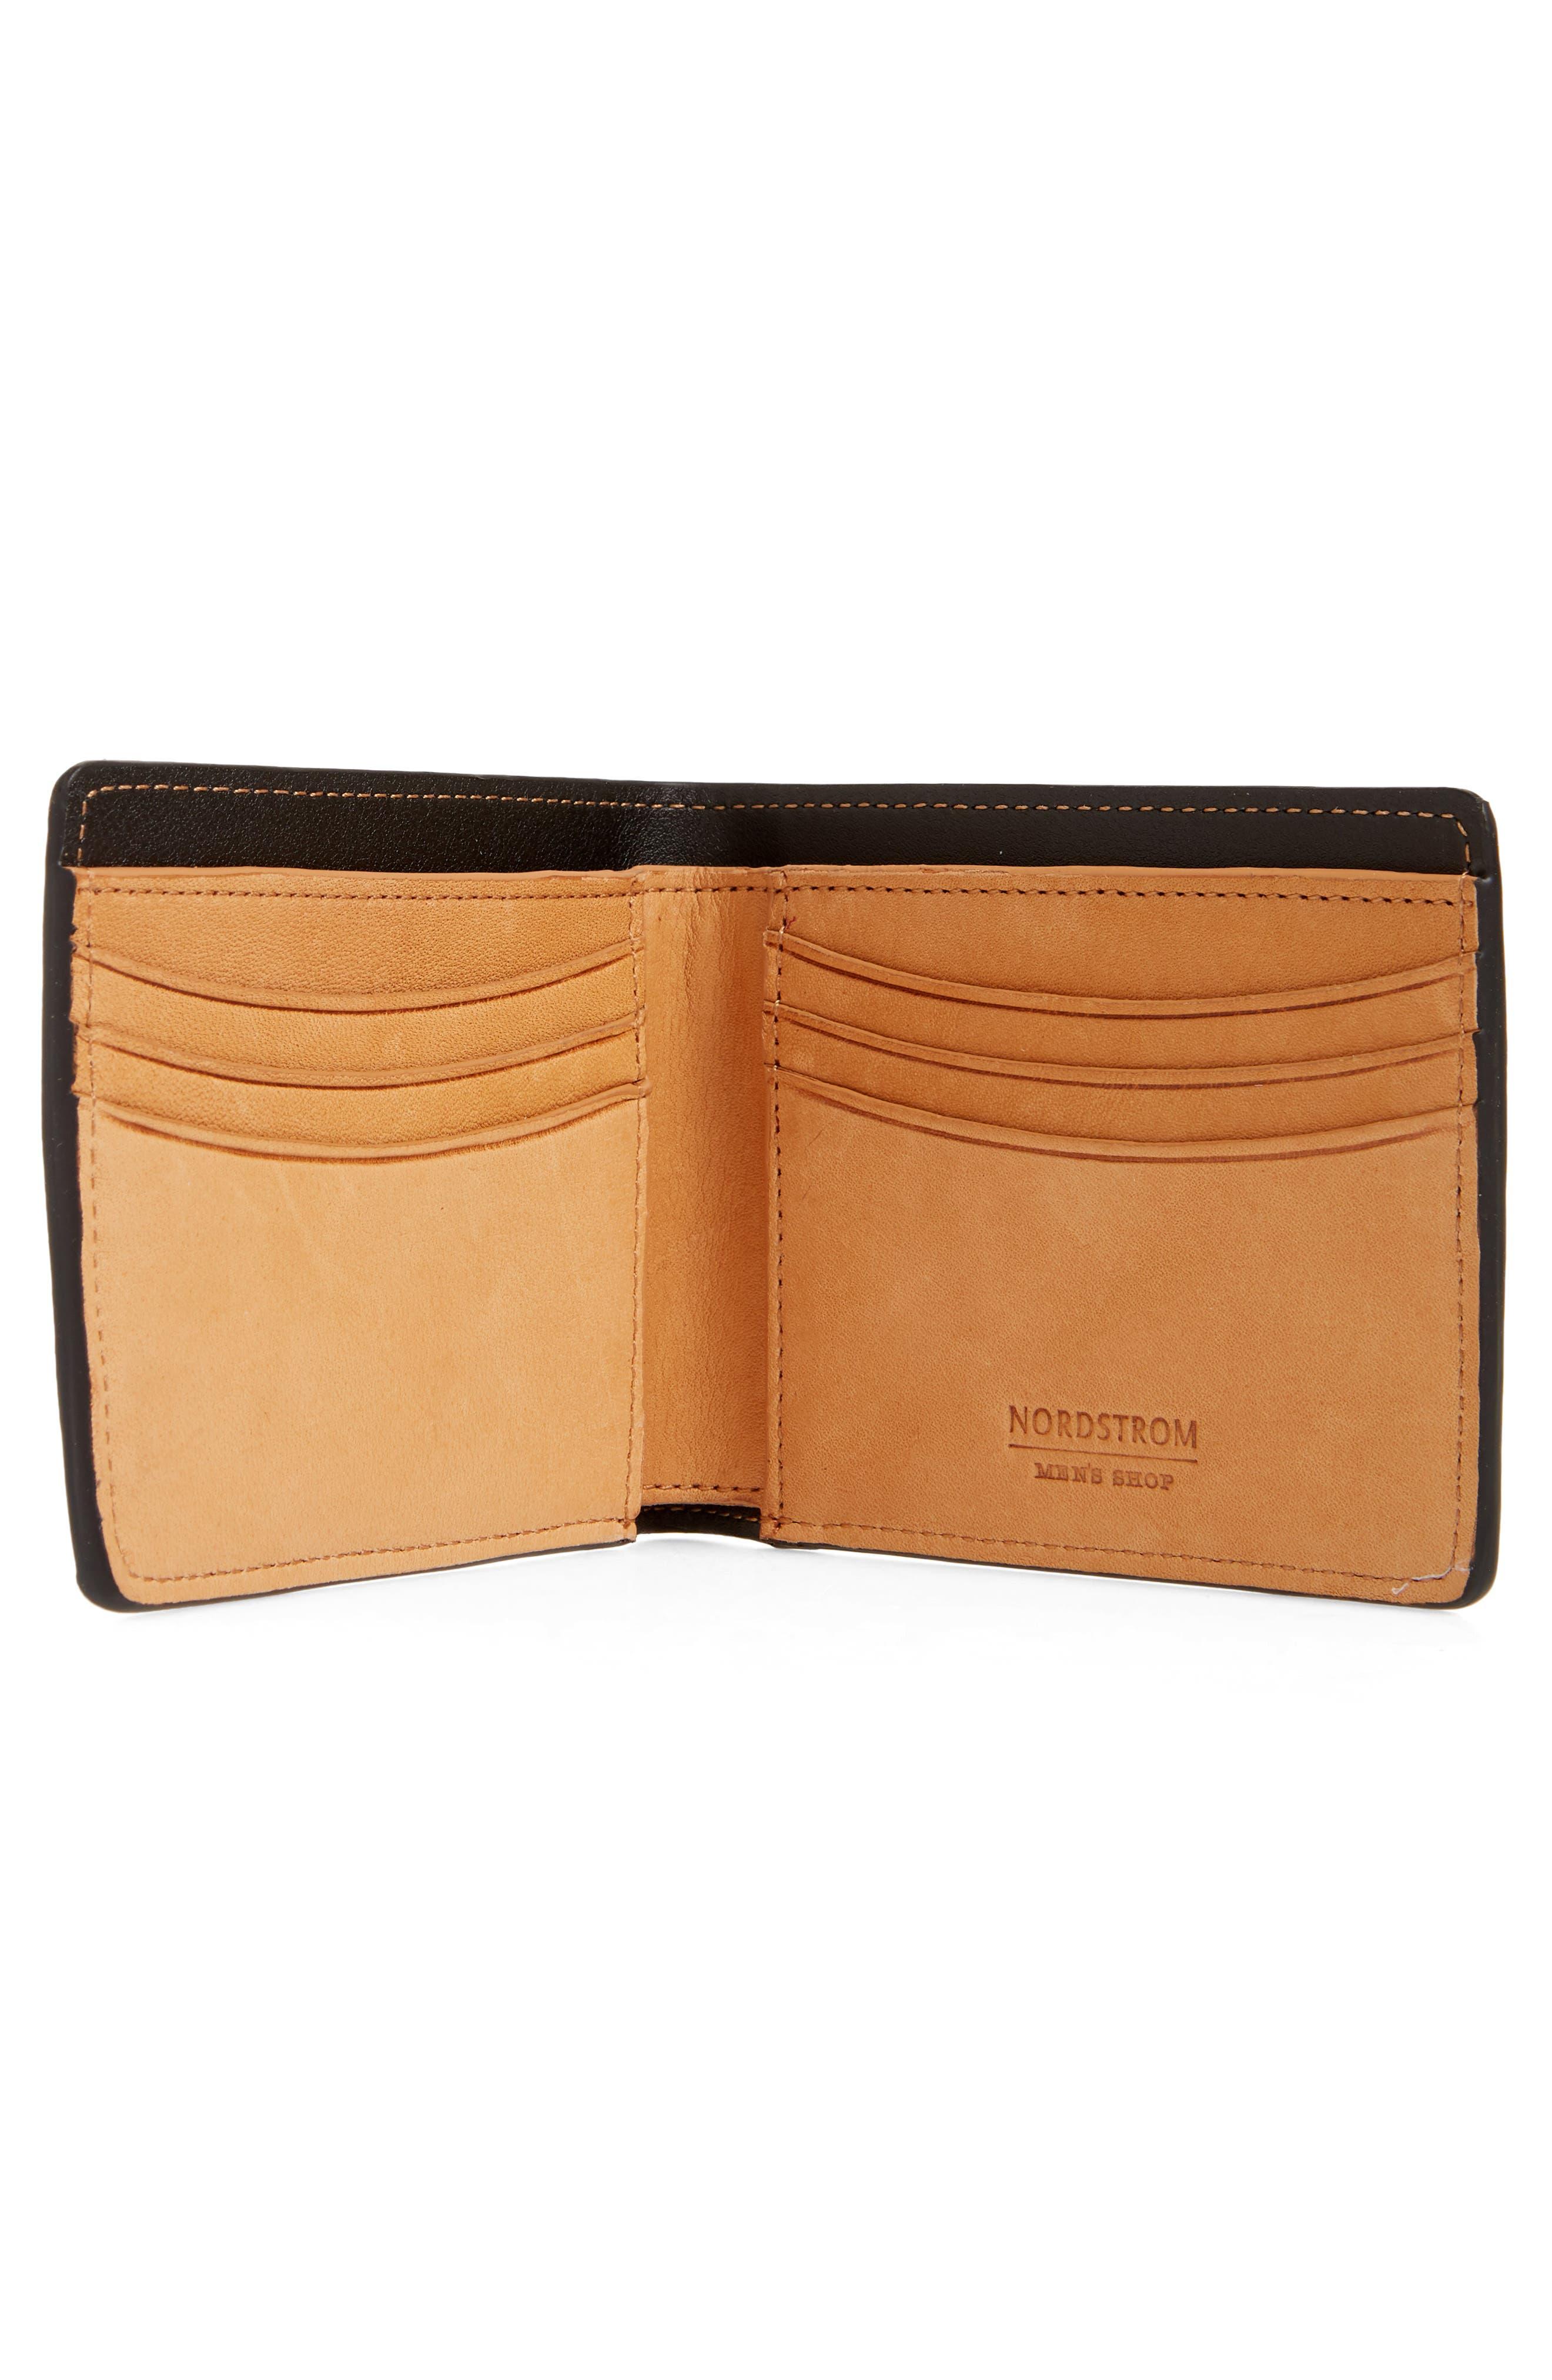 Darien Leather Wallet,                             Alternate thumbnail 2, color,                             001